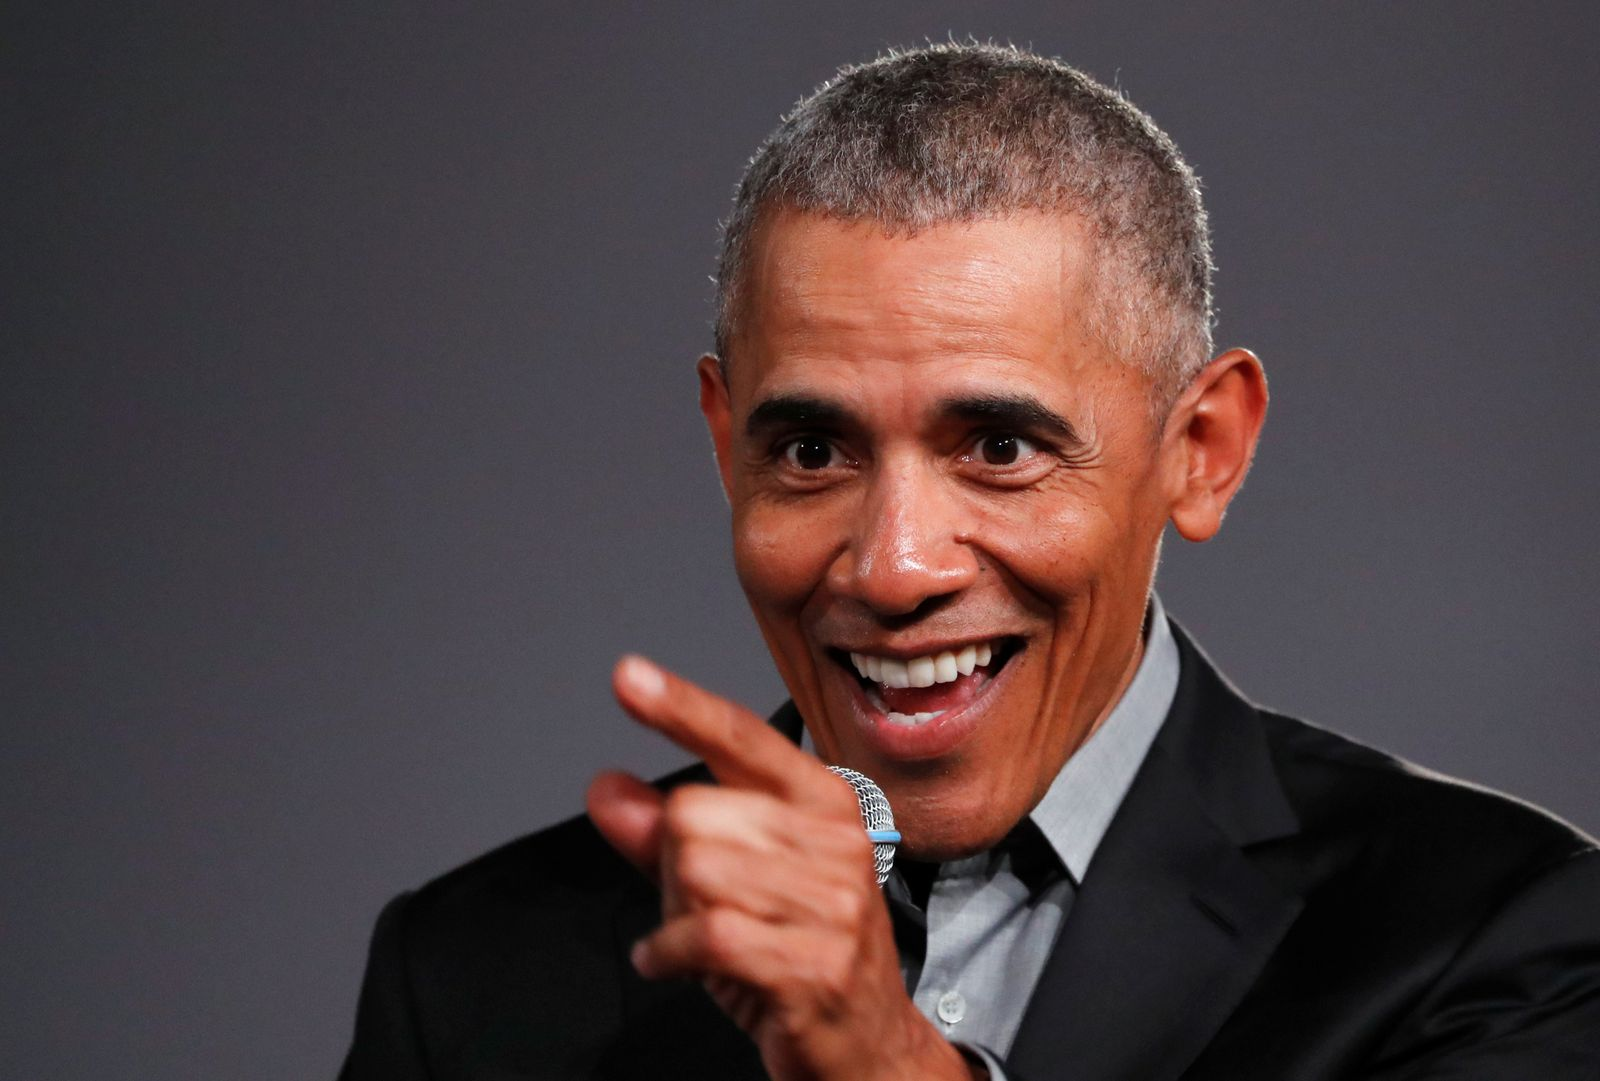 Obama/ Berlin